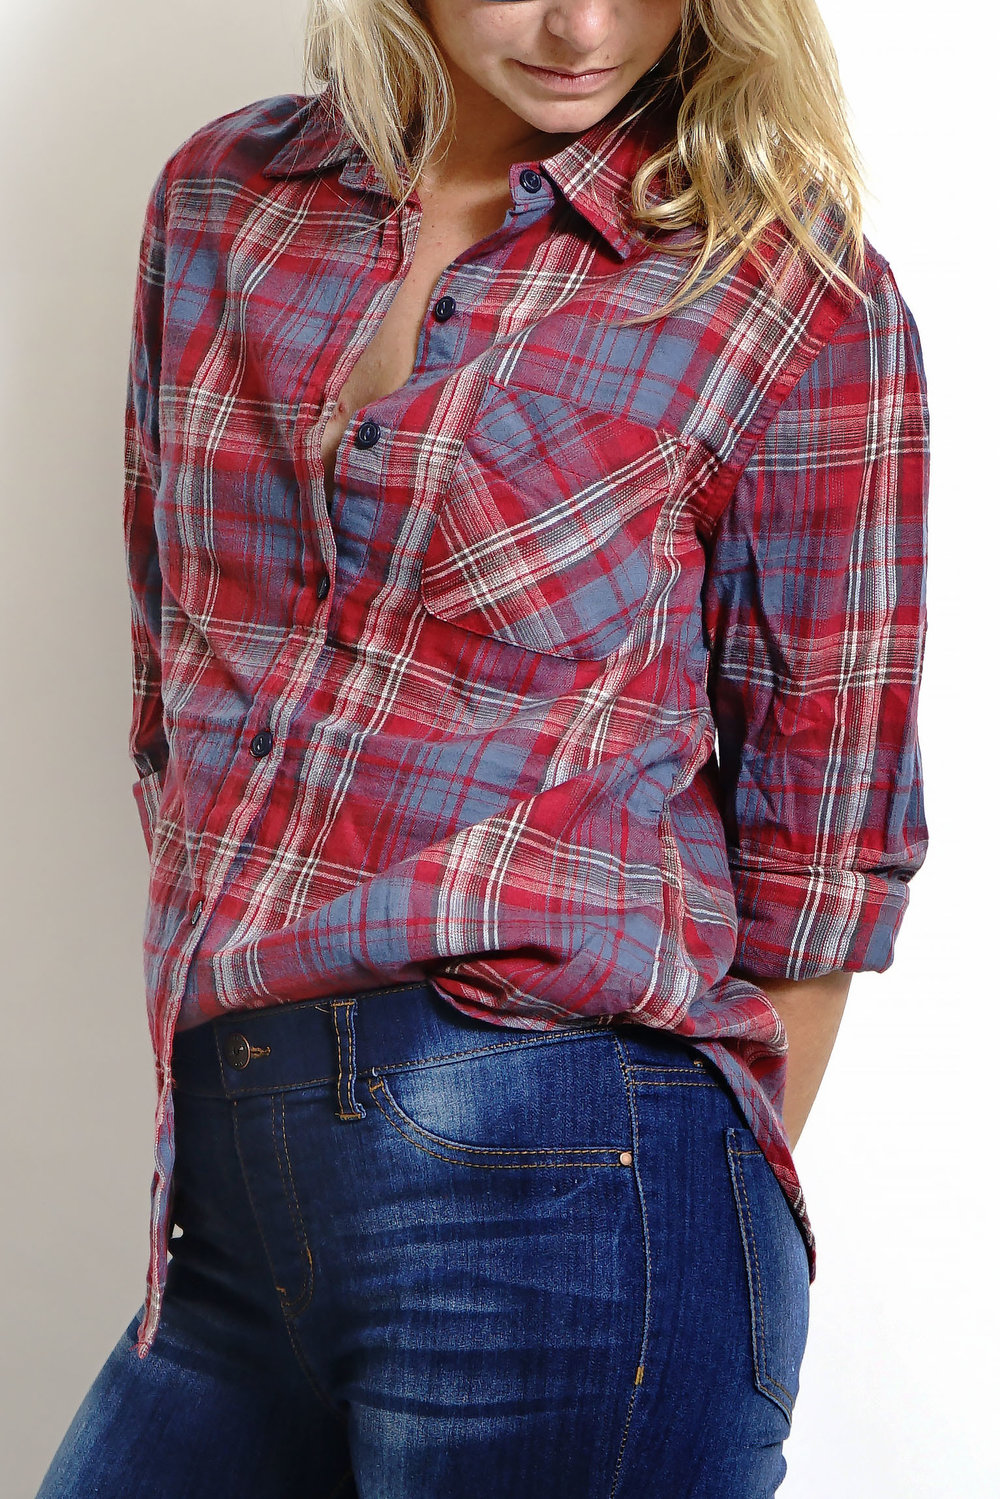 Shirt-V10009-P174F-Red:Navy-Half side2.jpg